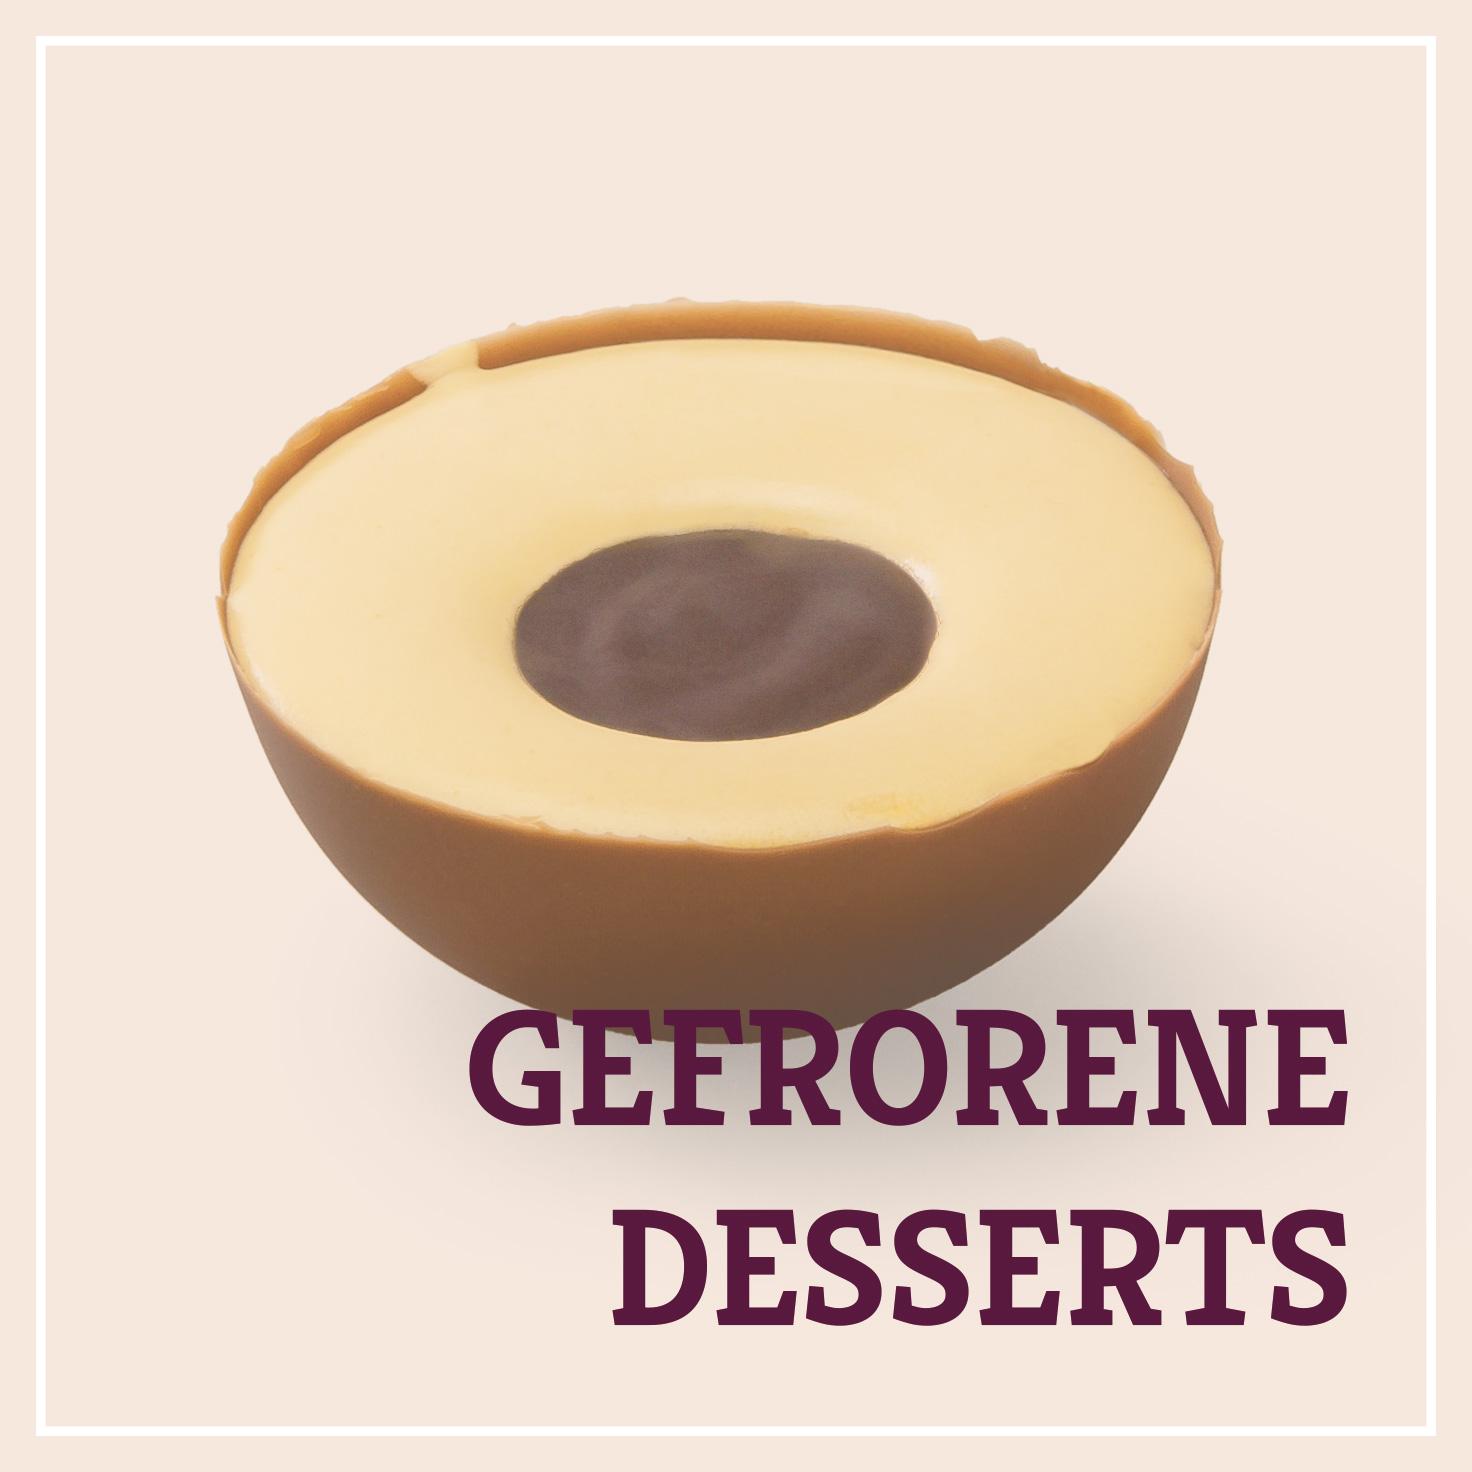 Heiss & Süß - Gefrorene Desserts